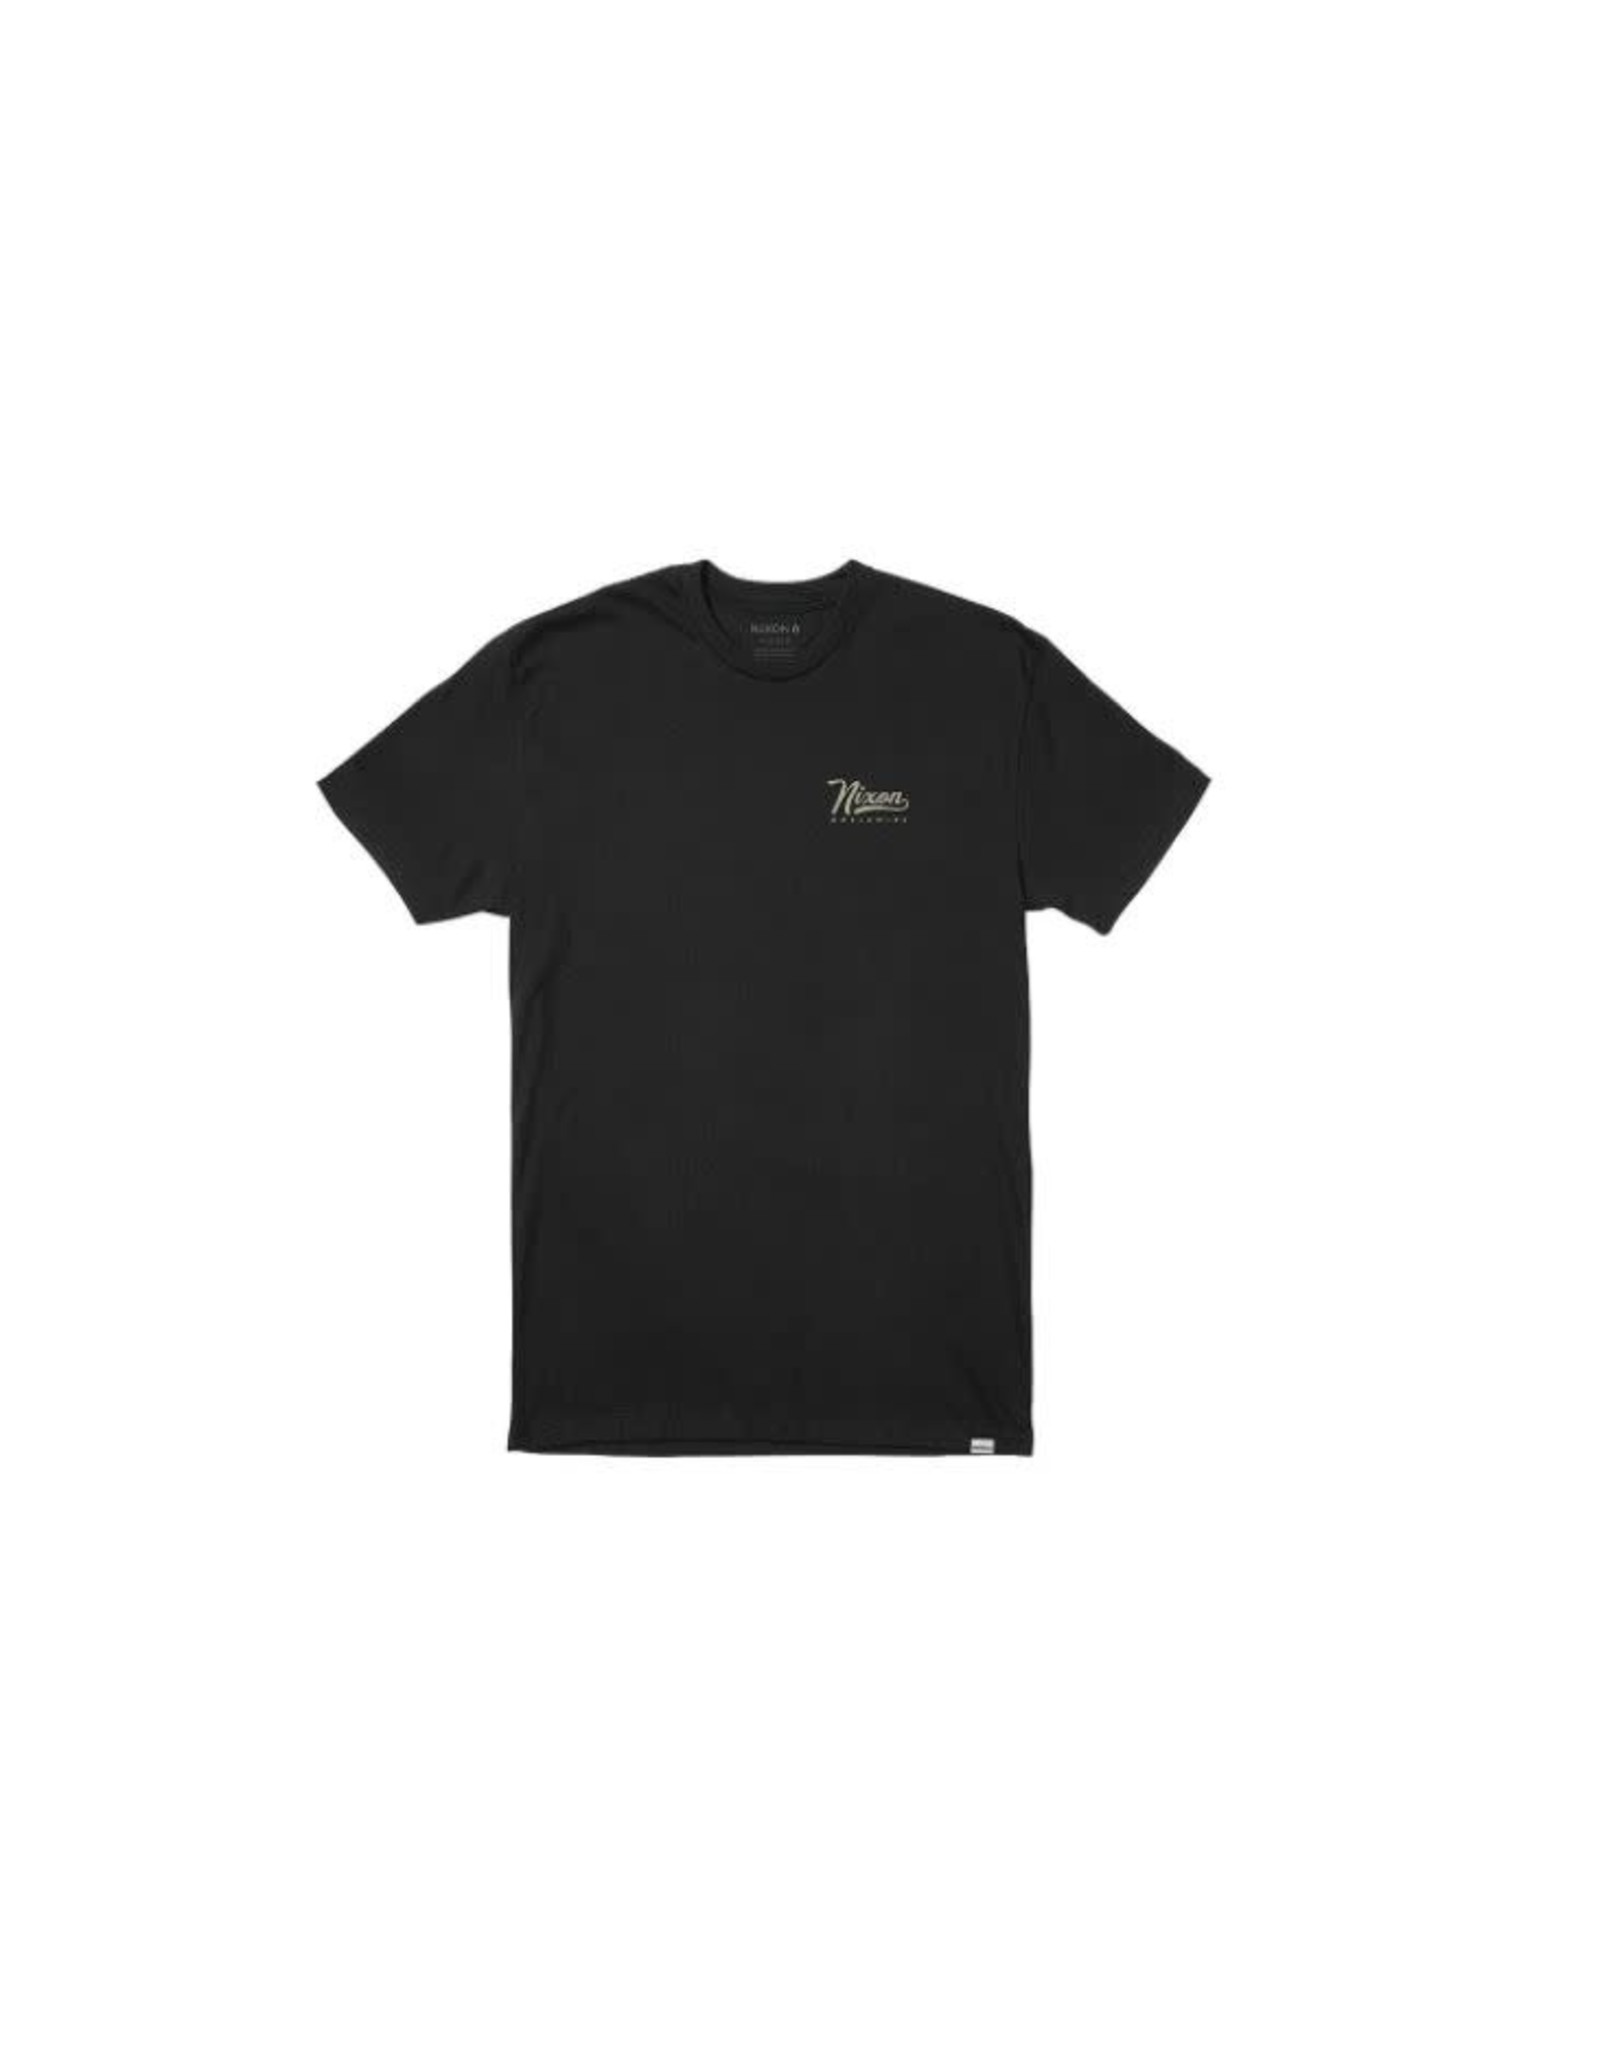 nixon Nixon - T-shirt homme looped black